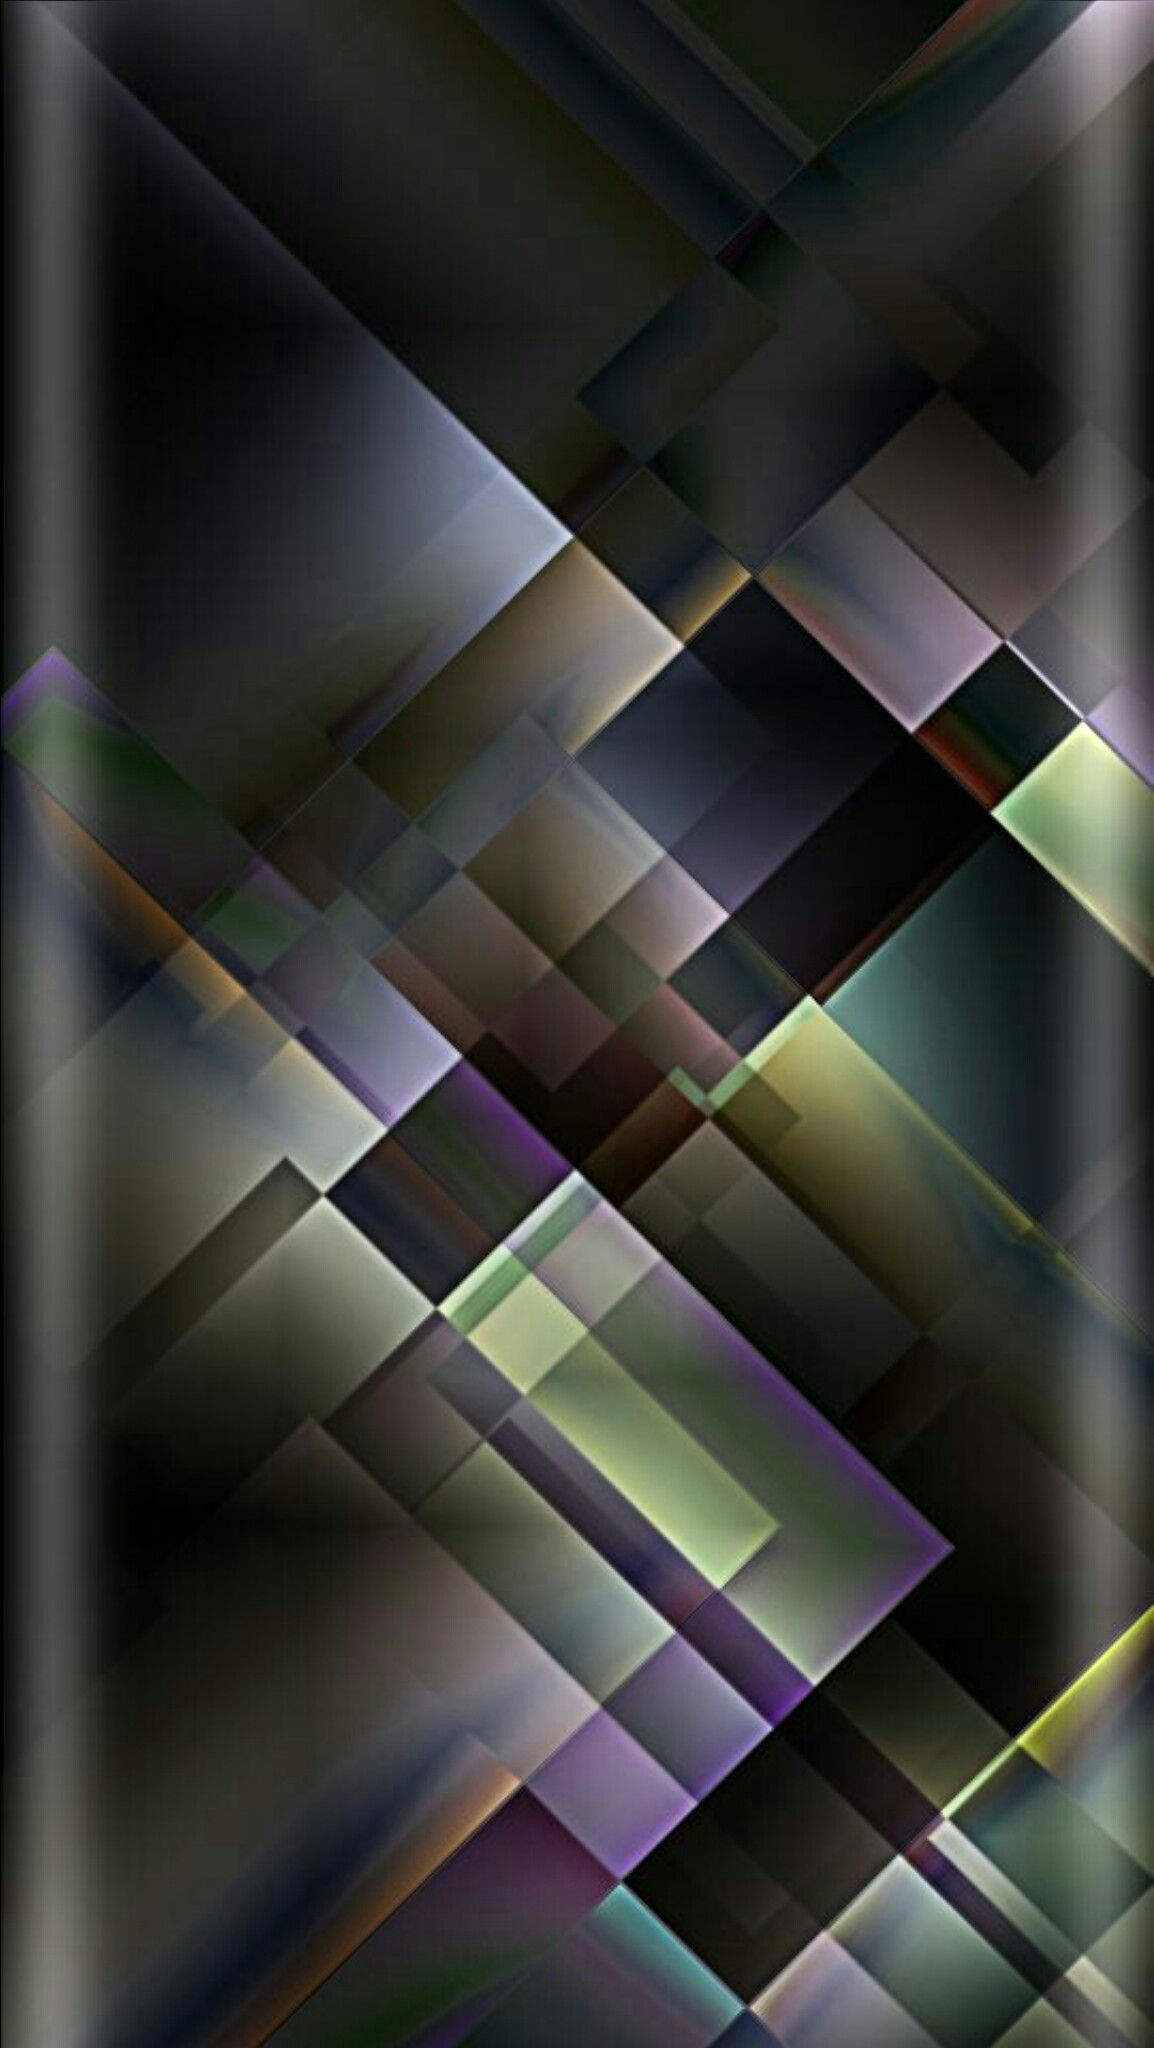 Abstract Phone - HD Wallpaper